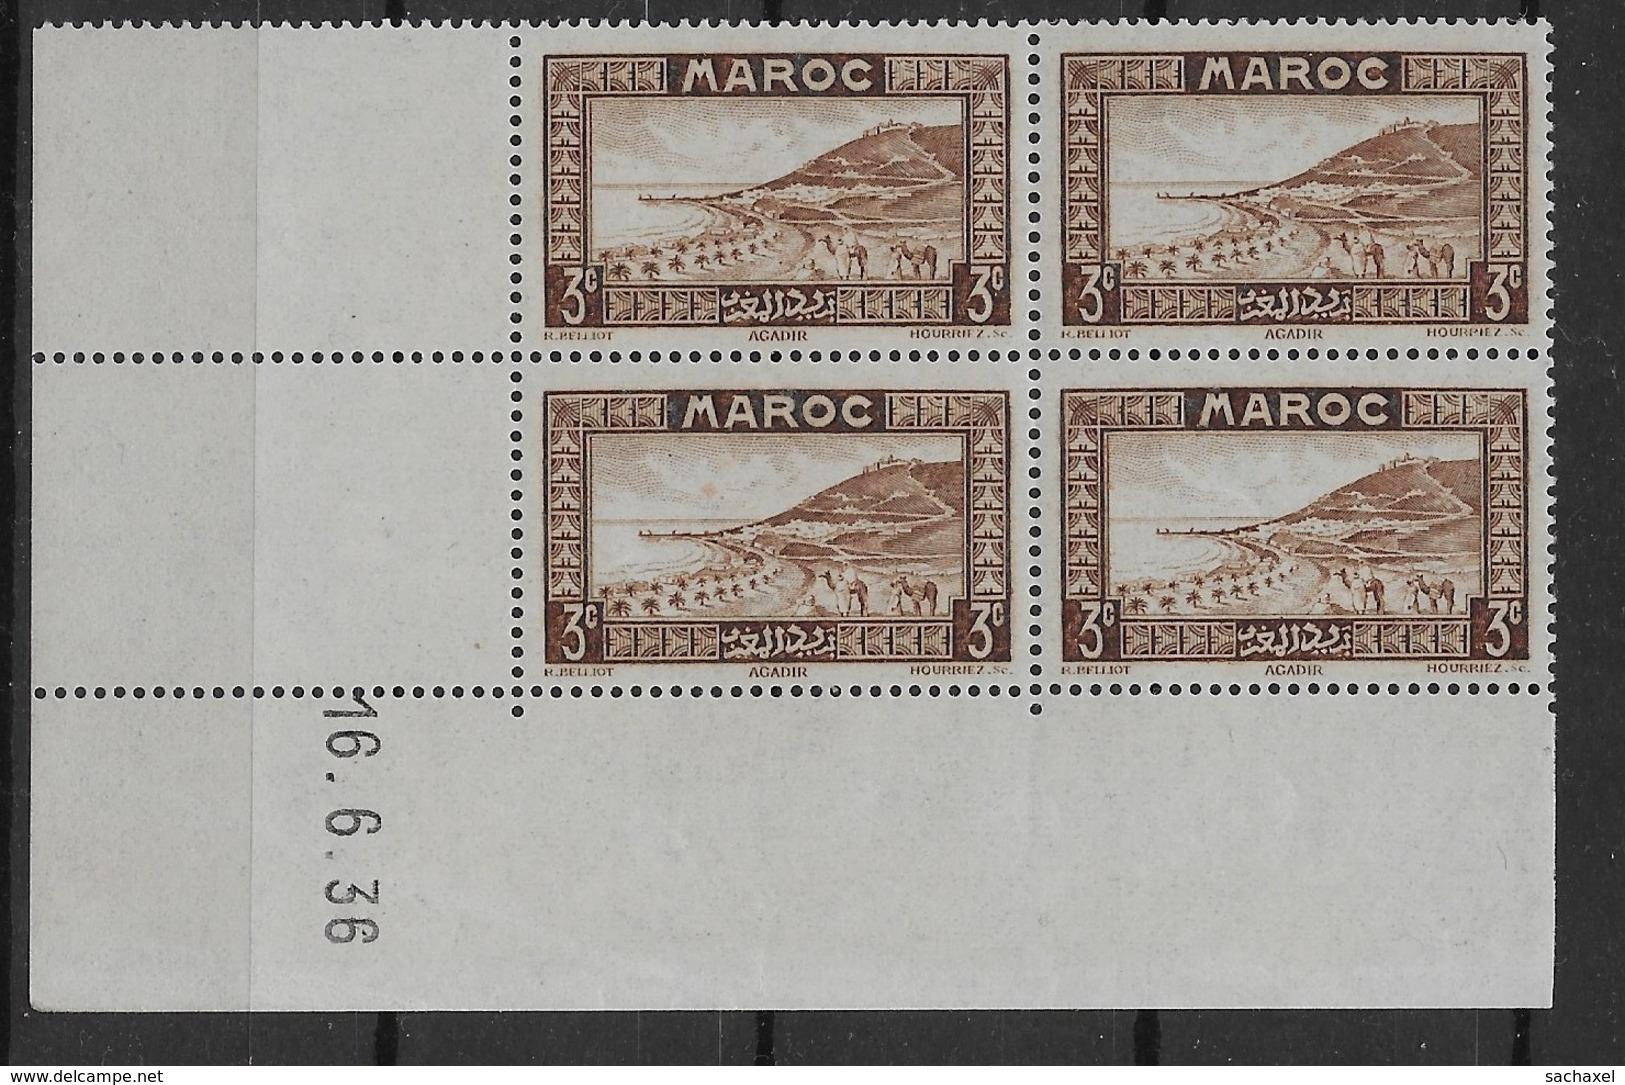 1933-34 Maroc N° 130 Nf** MNH. ' Bloc Coin Daté 16. 6. 36 ). Rade D'Agadir - Marokko (1891-1956)